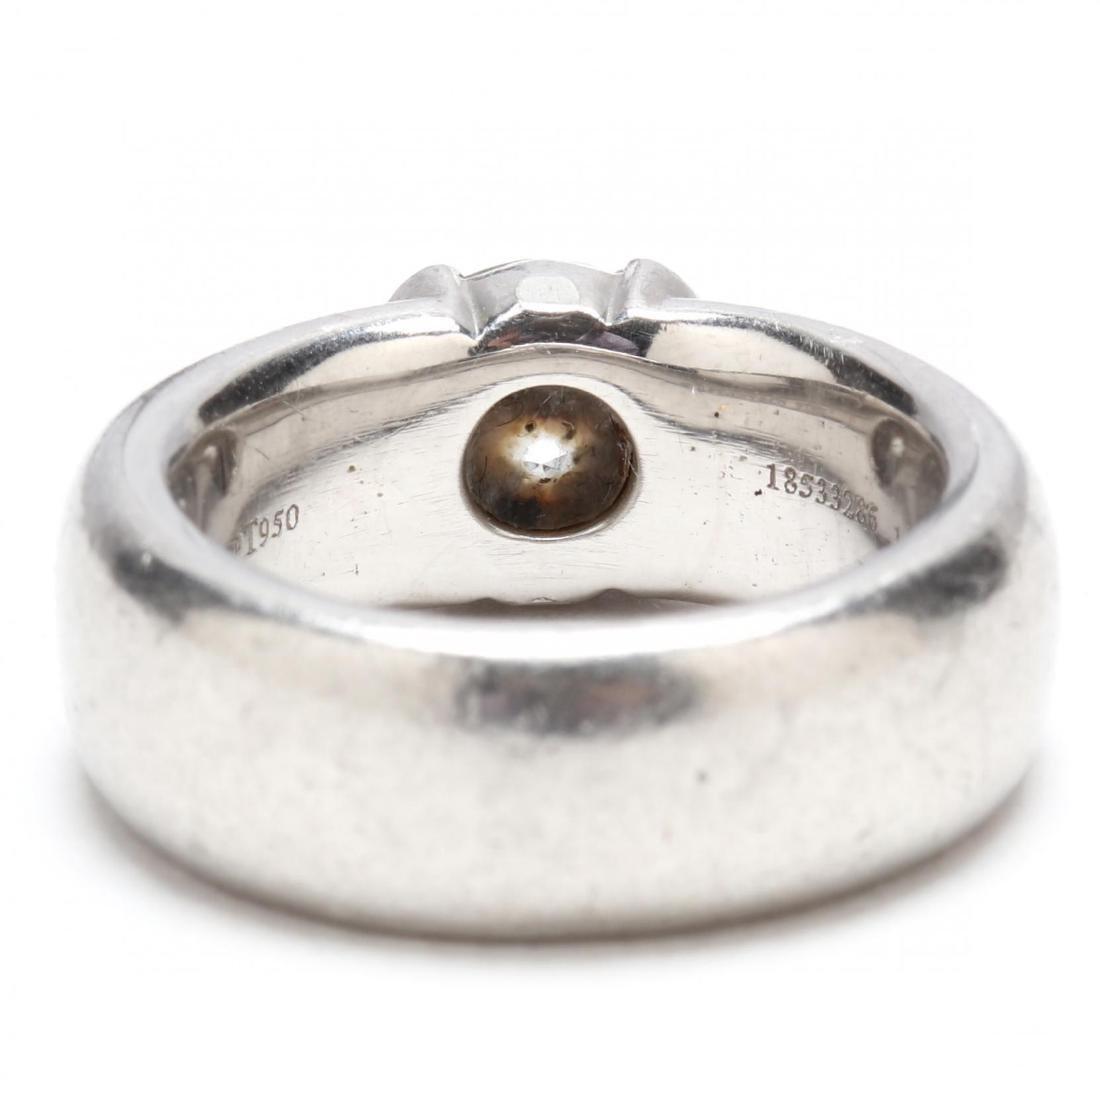 Platinum and Diamond Ring, Tiffany & Co. - 3